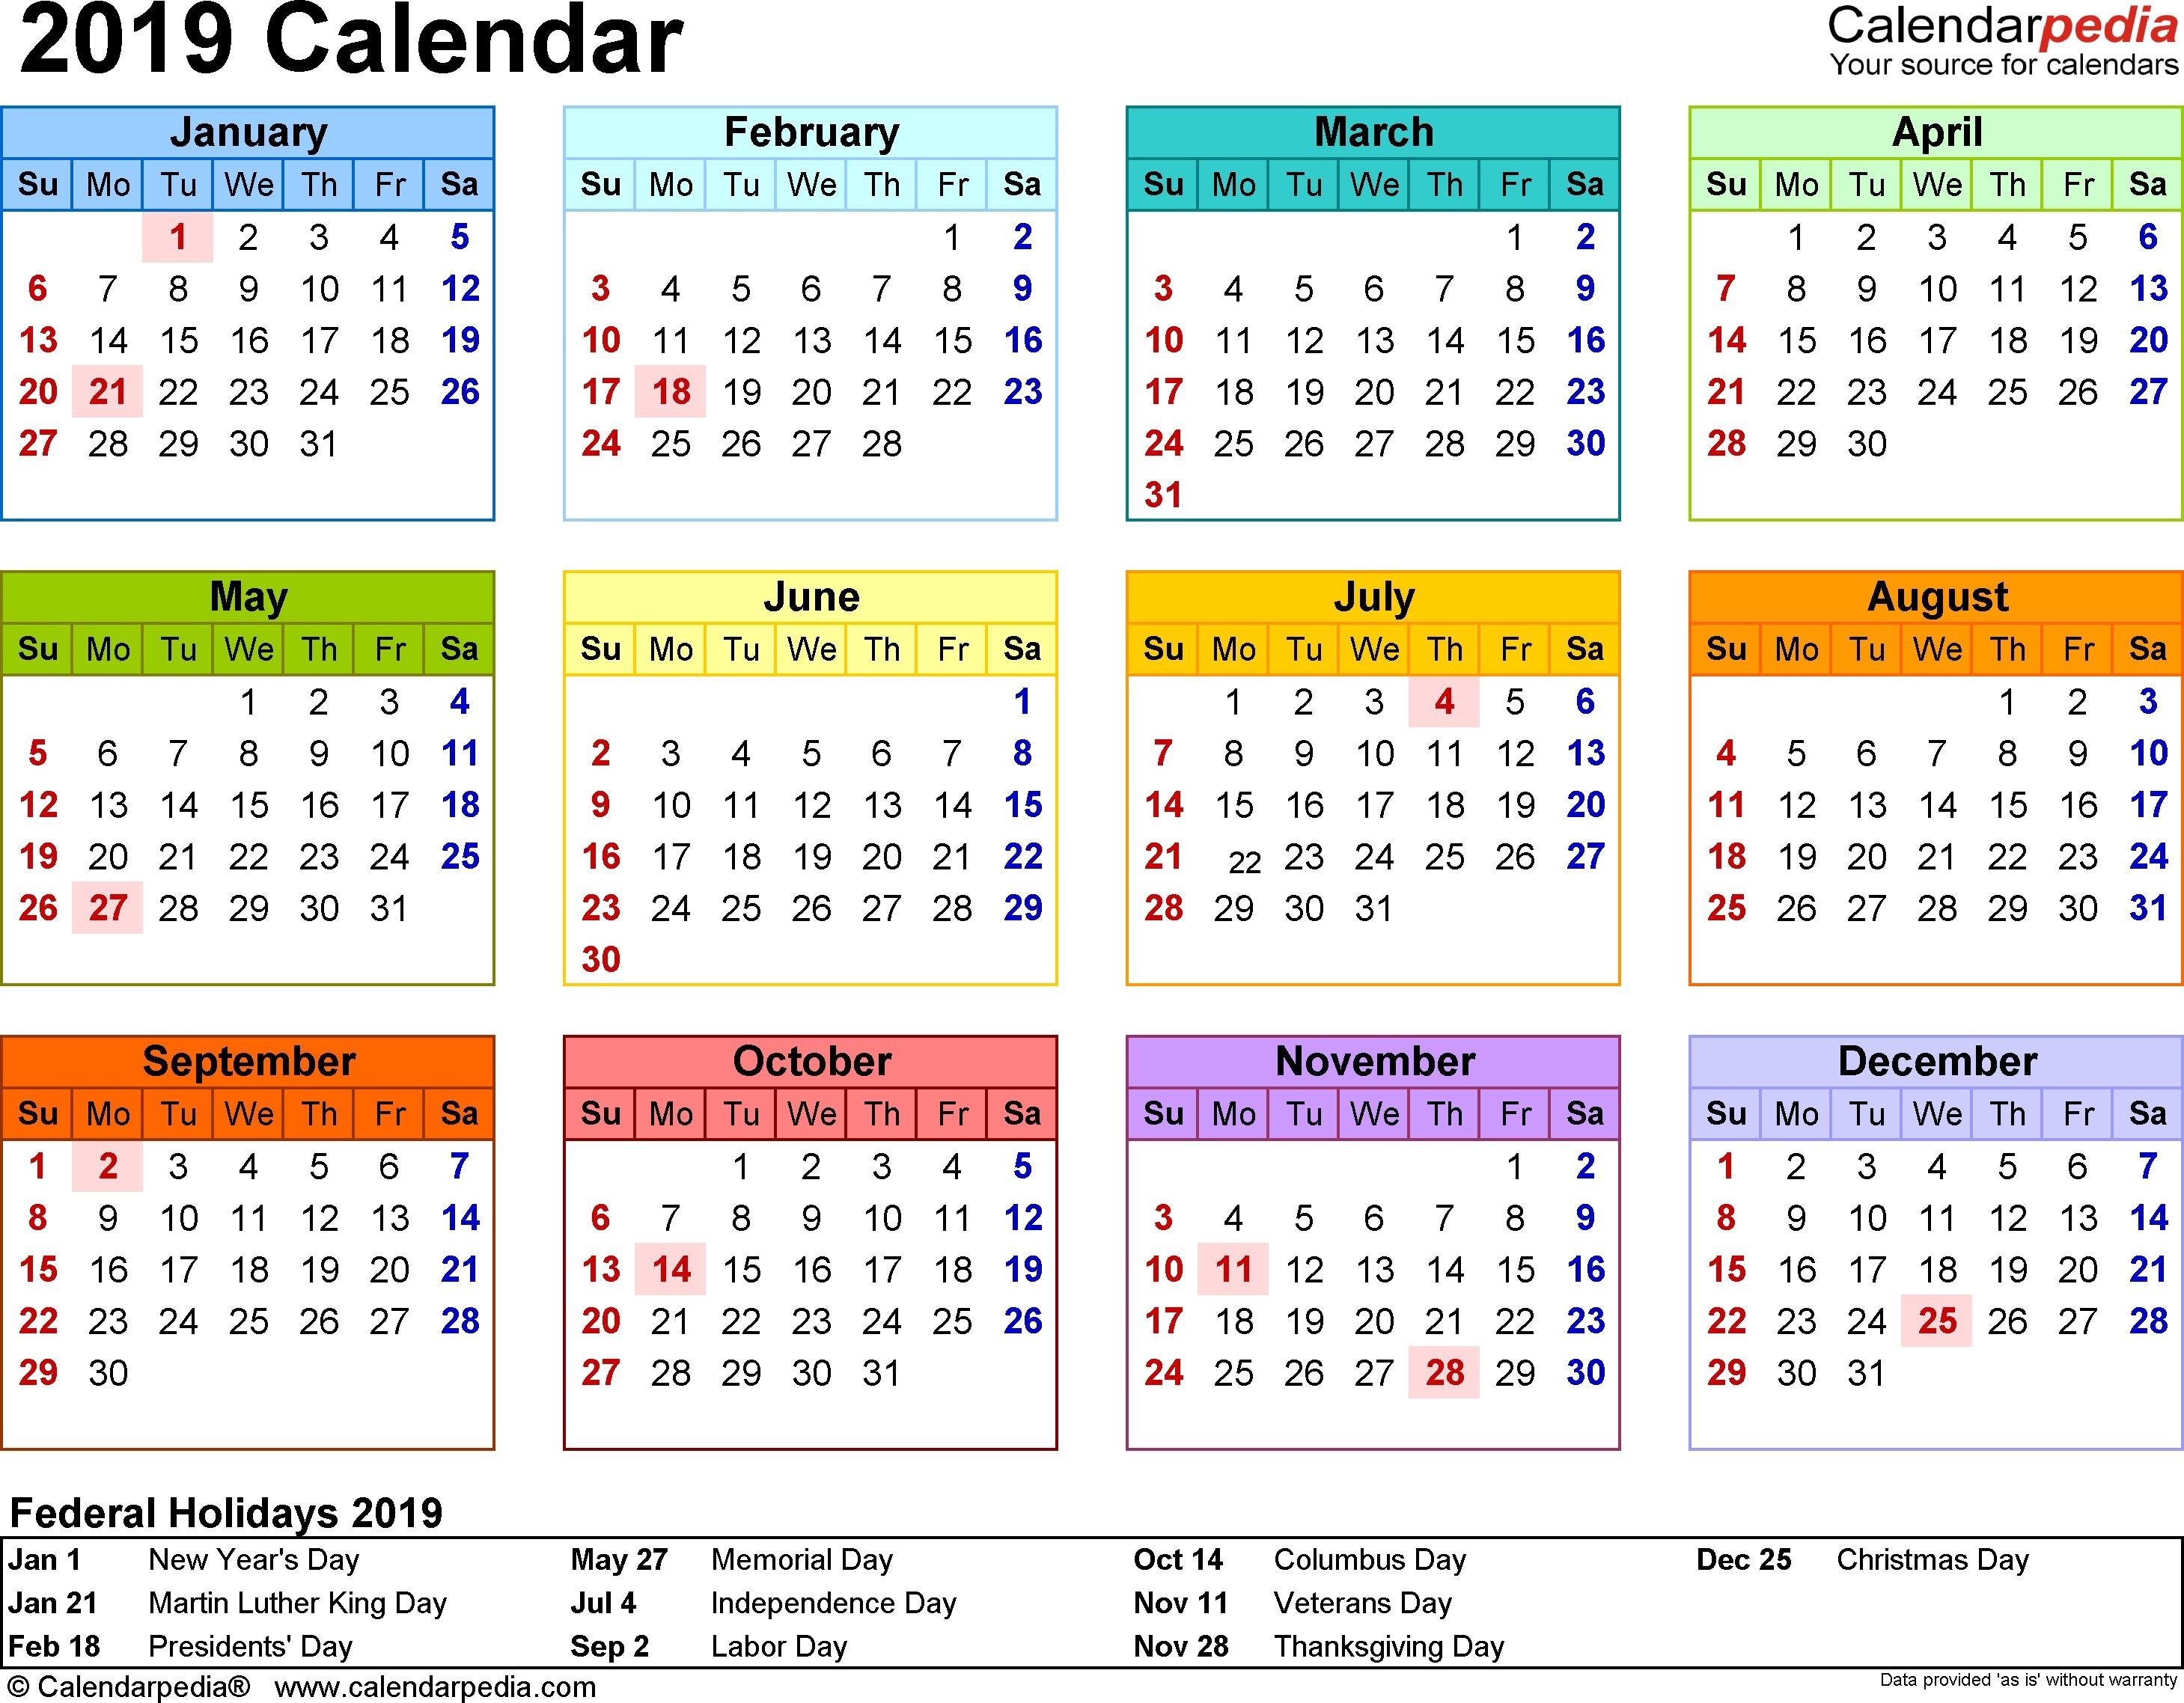 2019 Calendar Template Checkbook Size Calendar